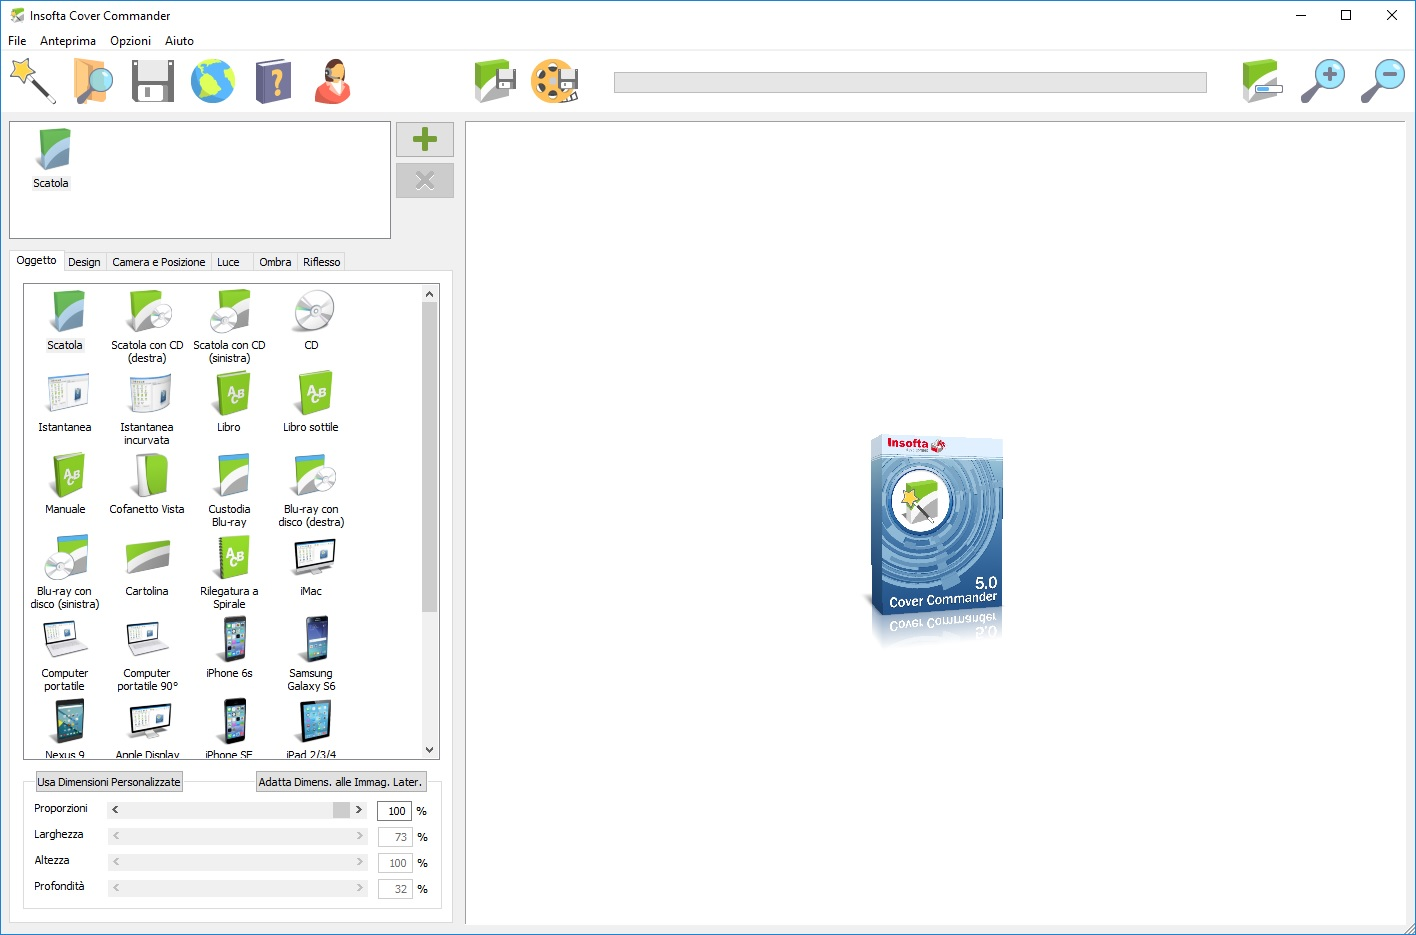 Insofta Cover Commander v5.7.0 - ITA